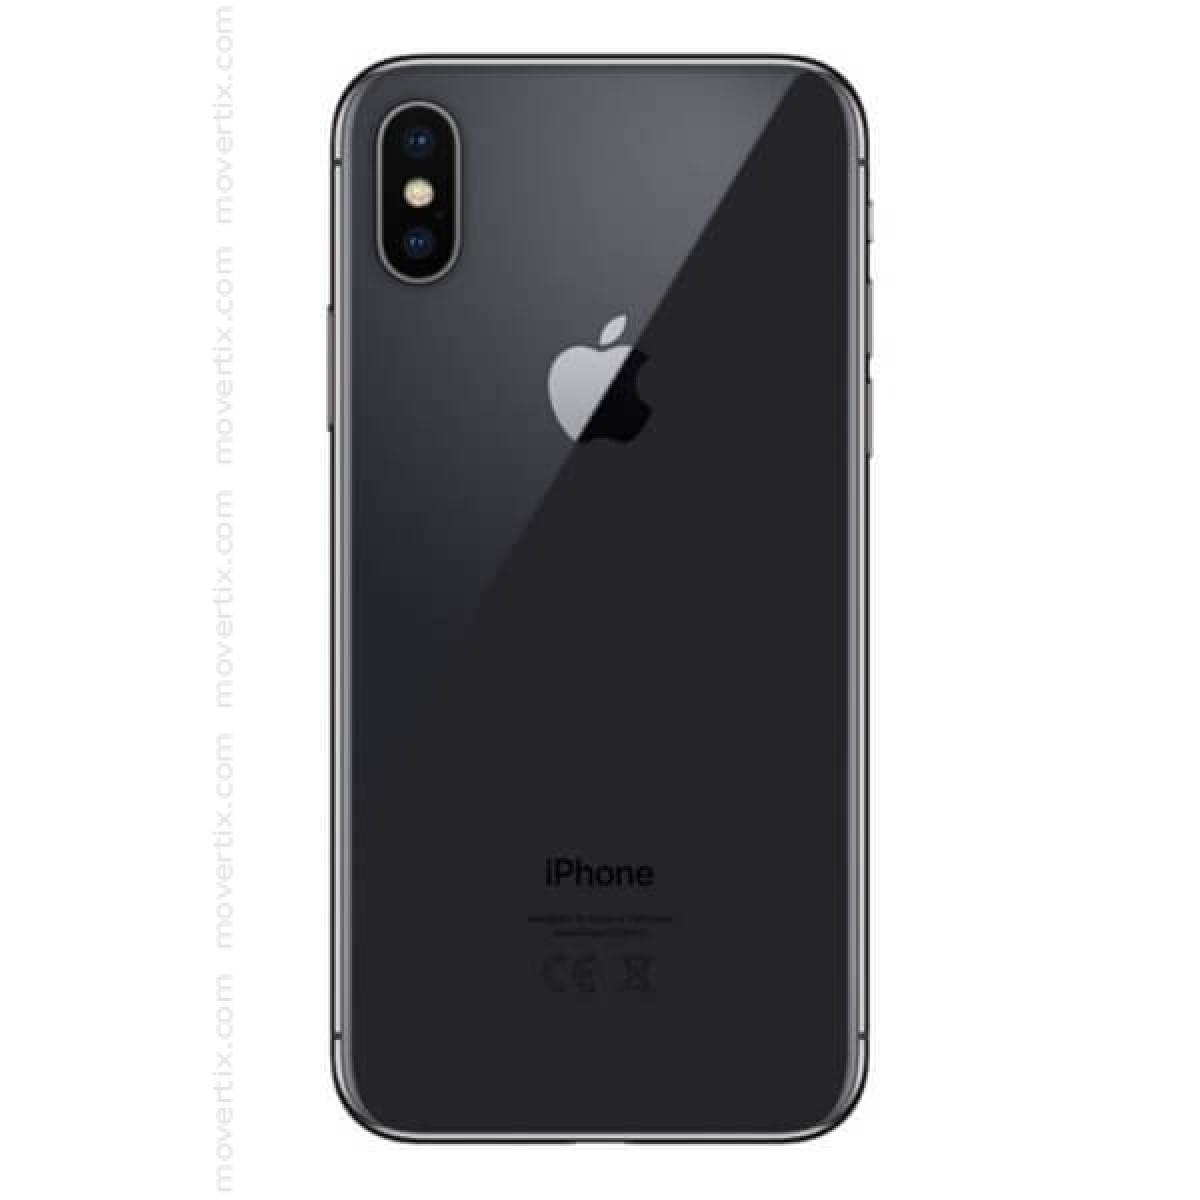 apple iphone x space grey 256gb 0190198458353 movertix mobile phones shop. Black Bedroom Furniture Sets. Home Design Ideas